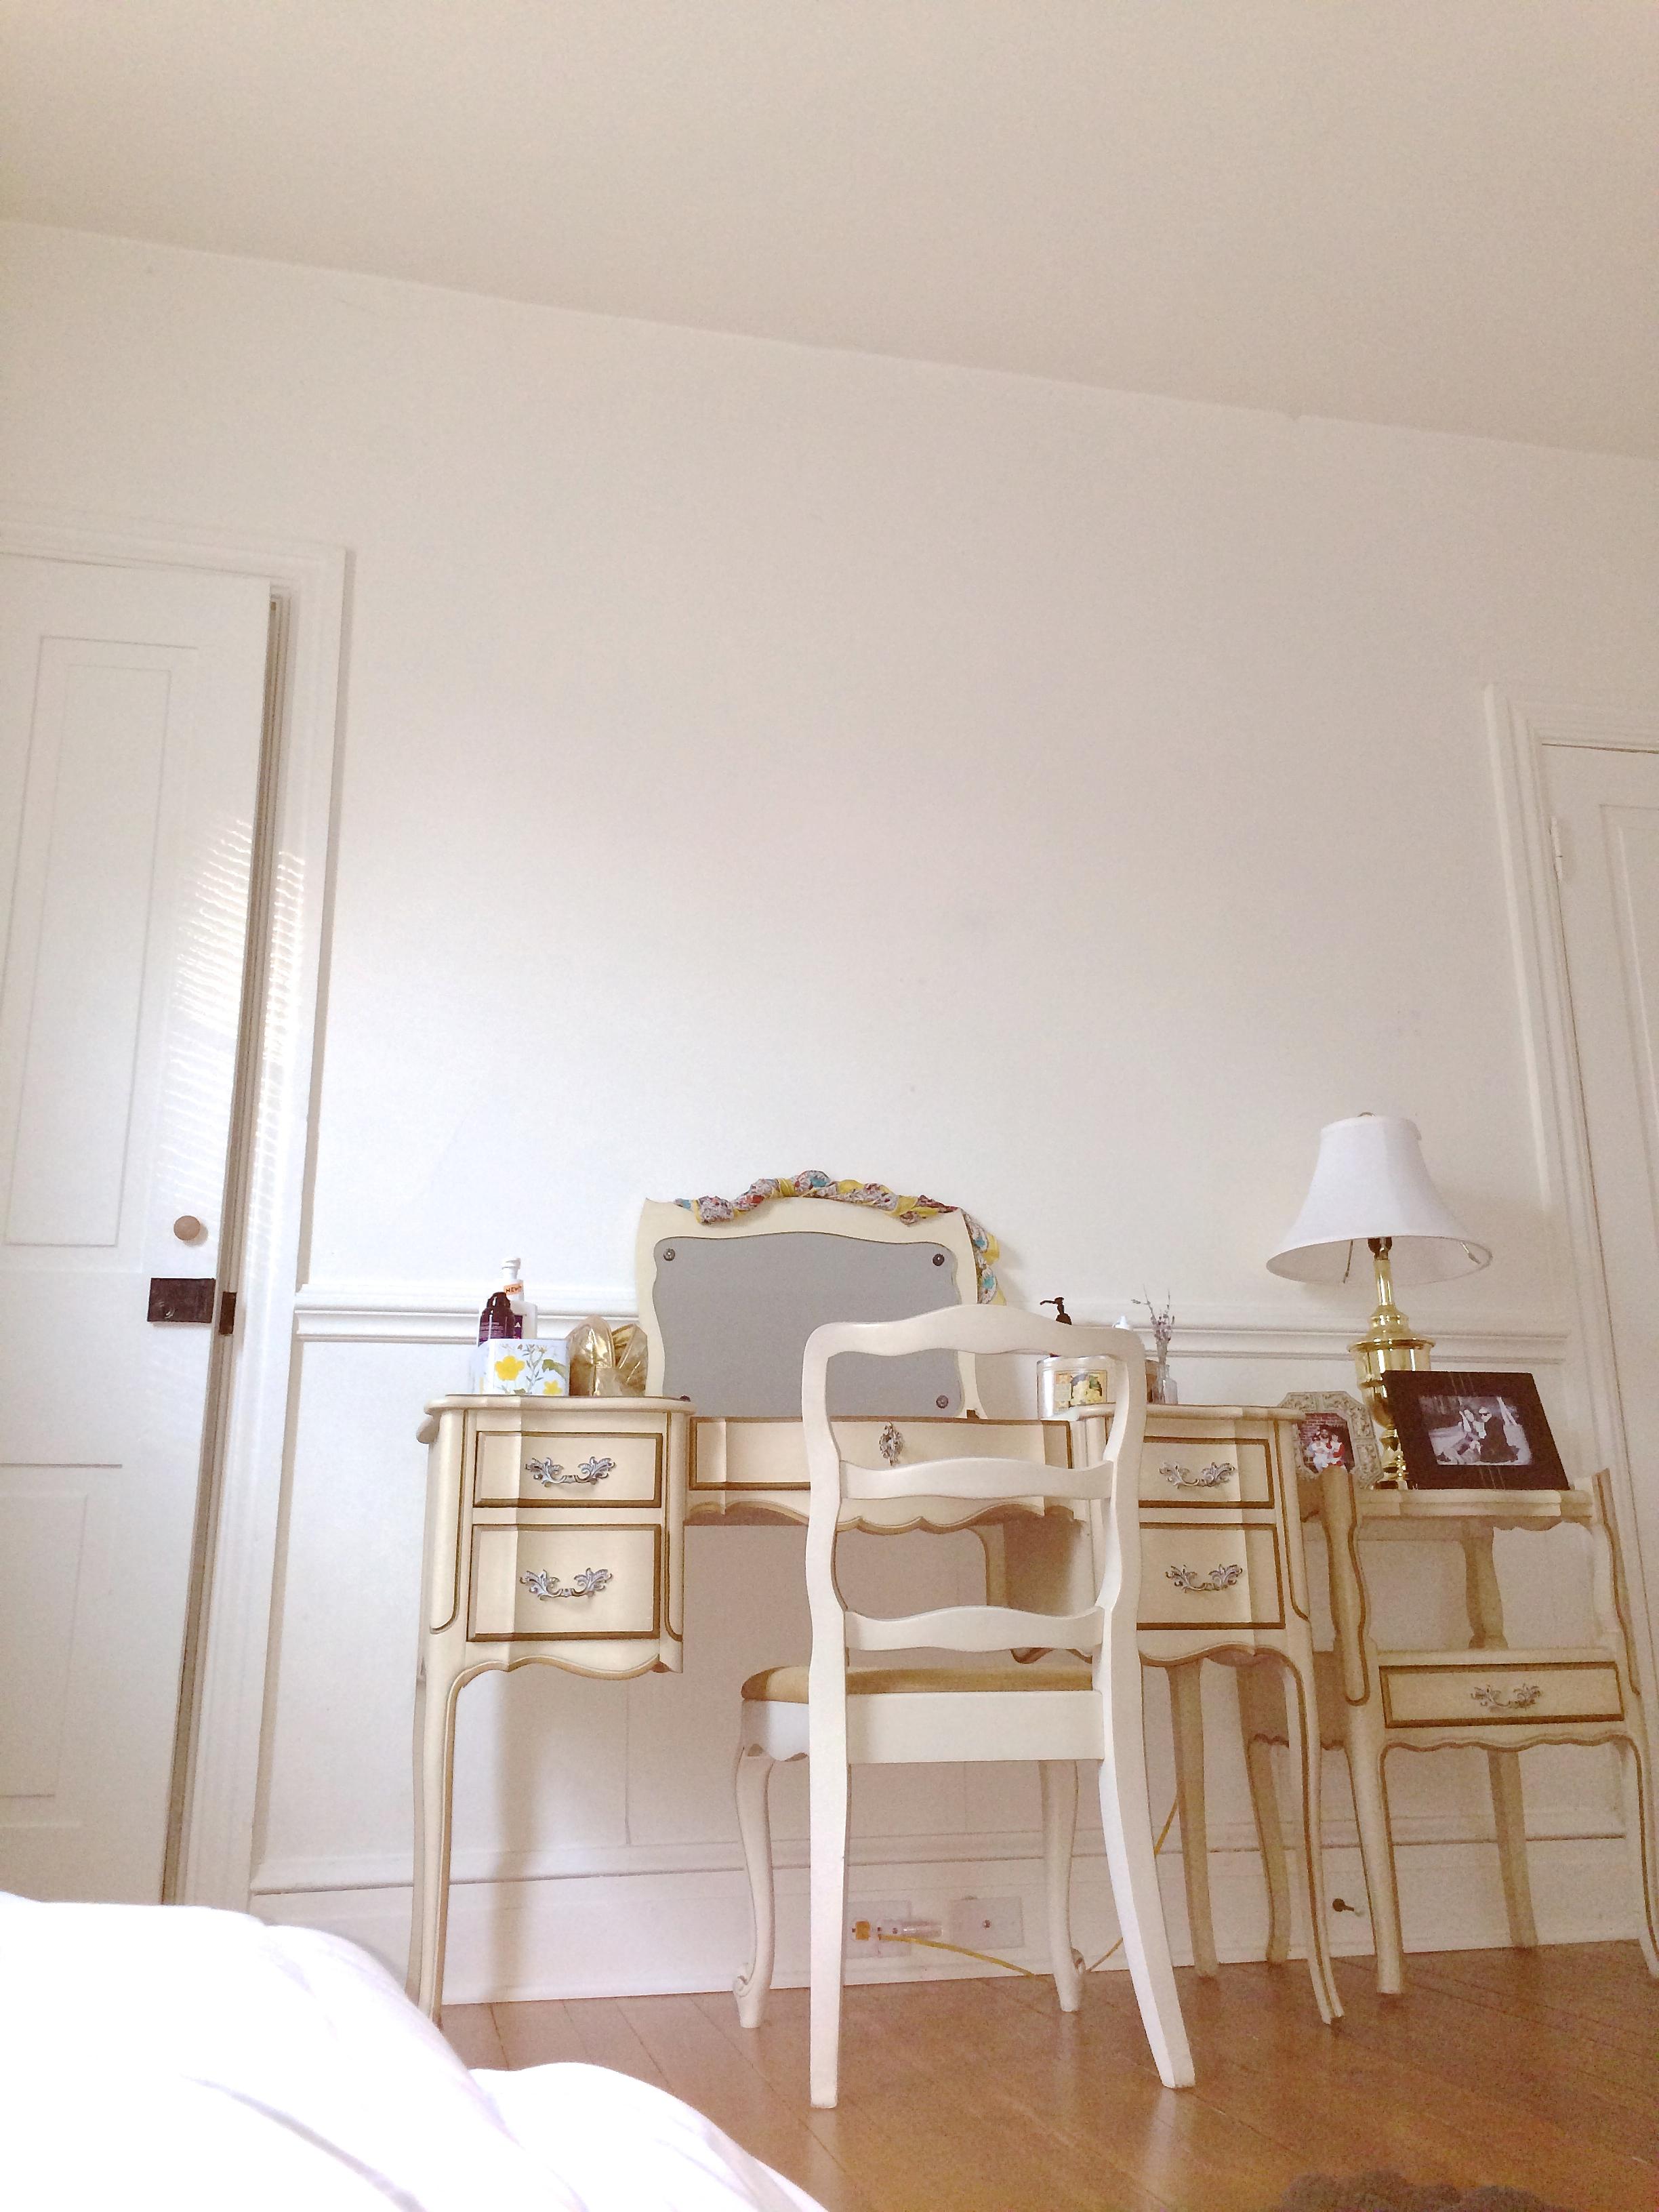 Amanda's room